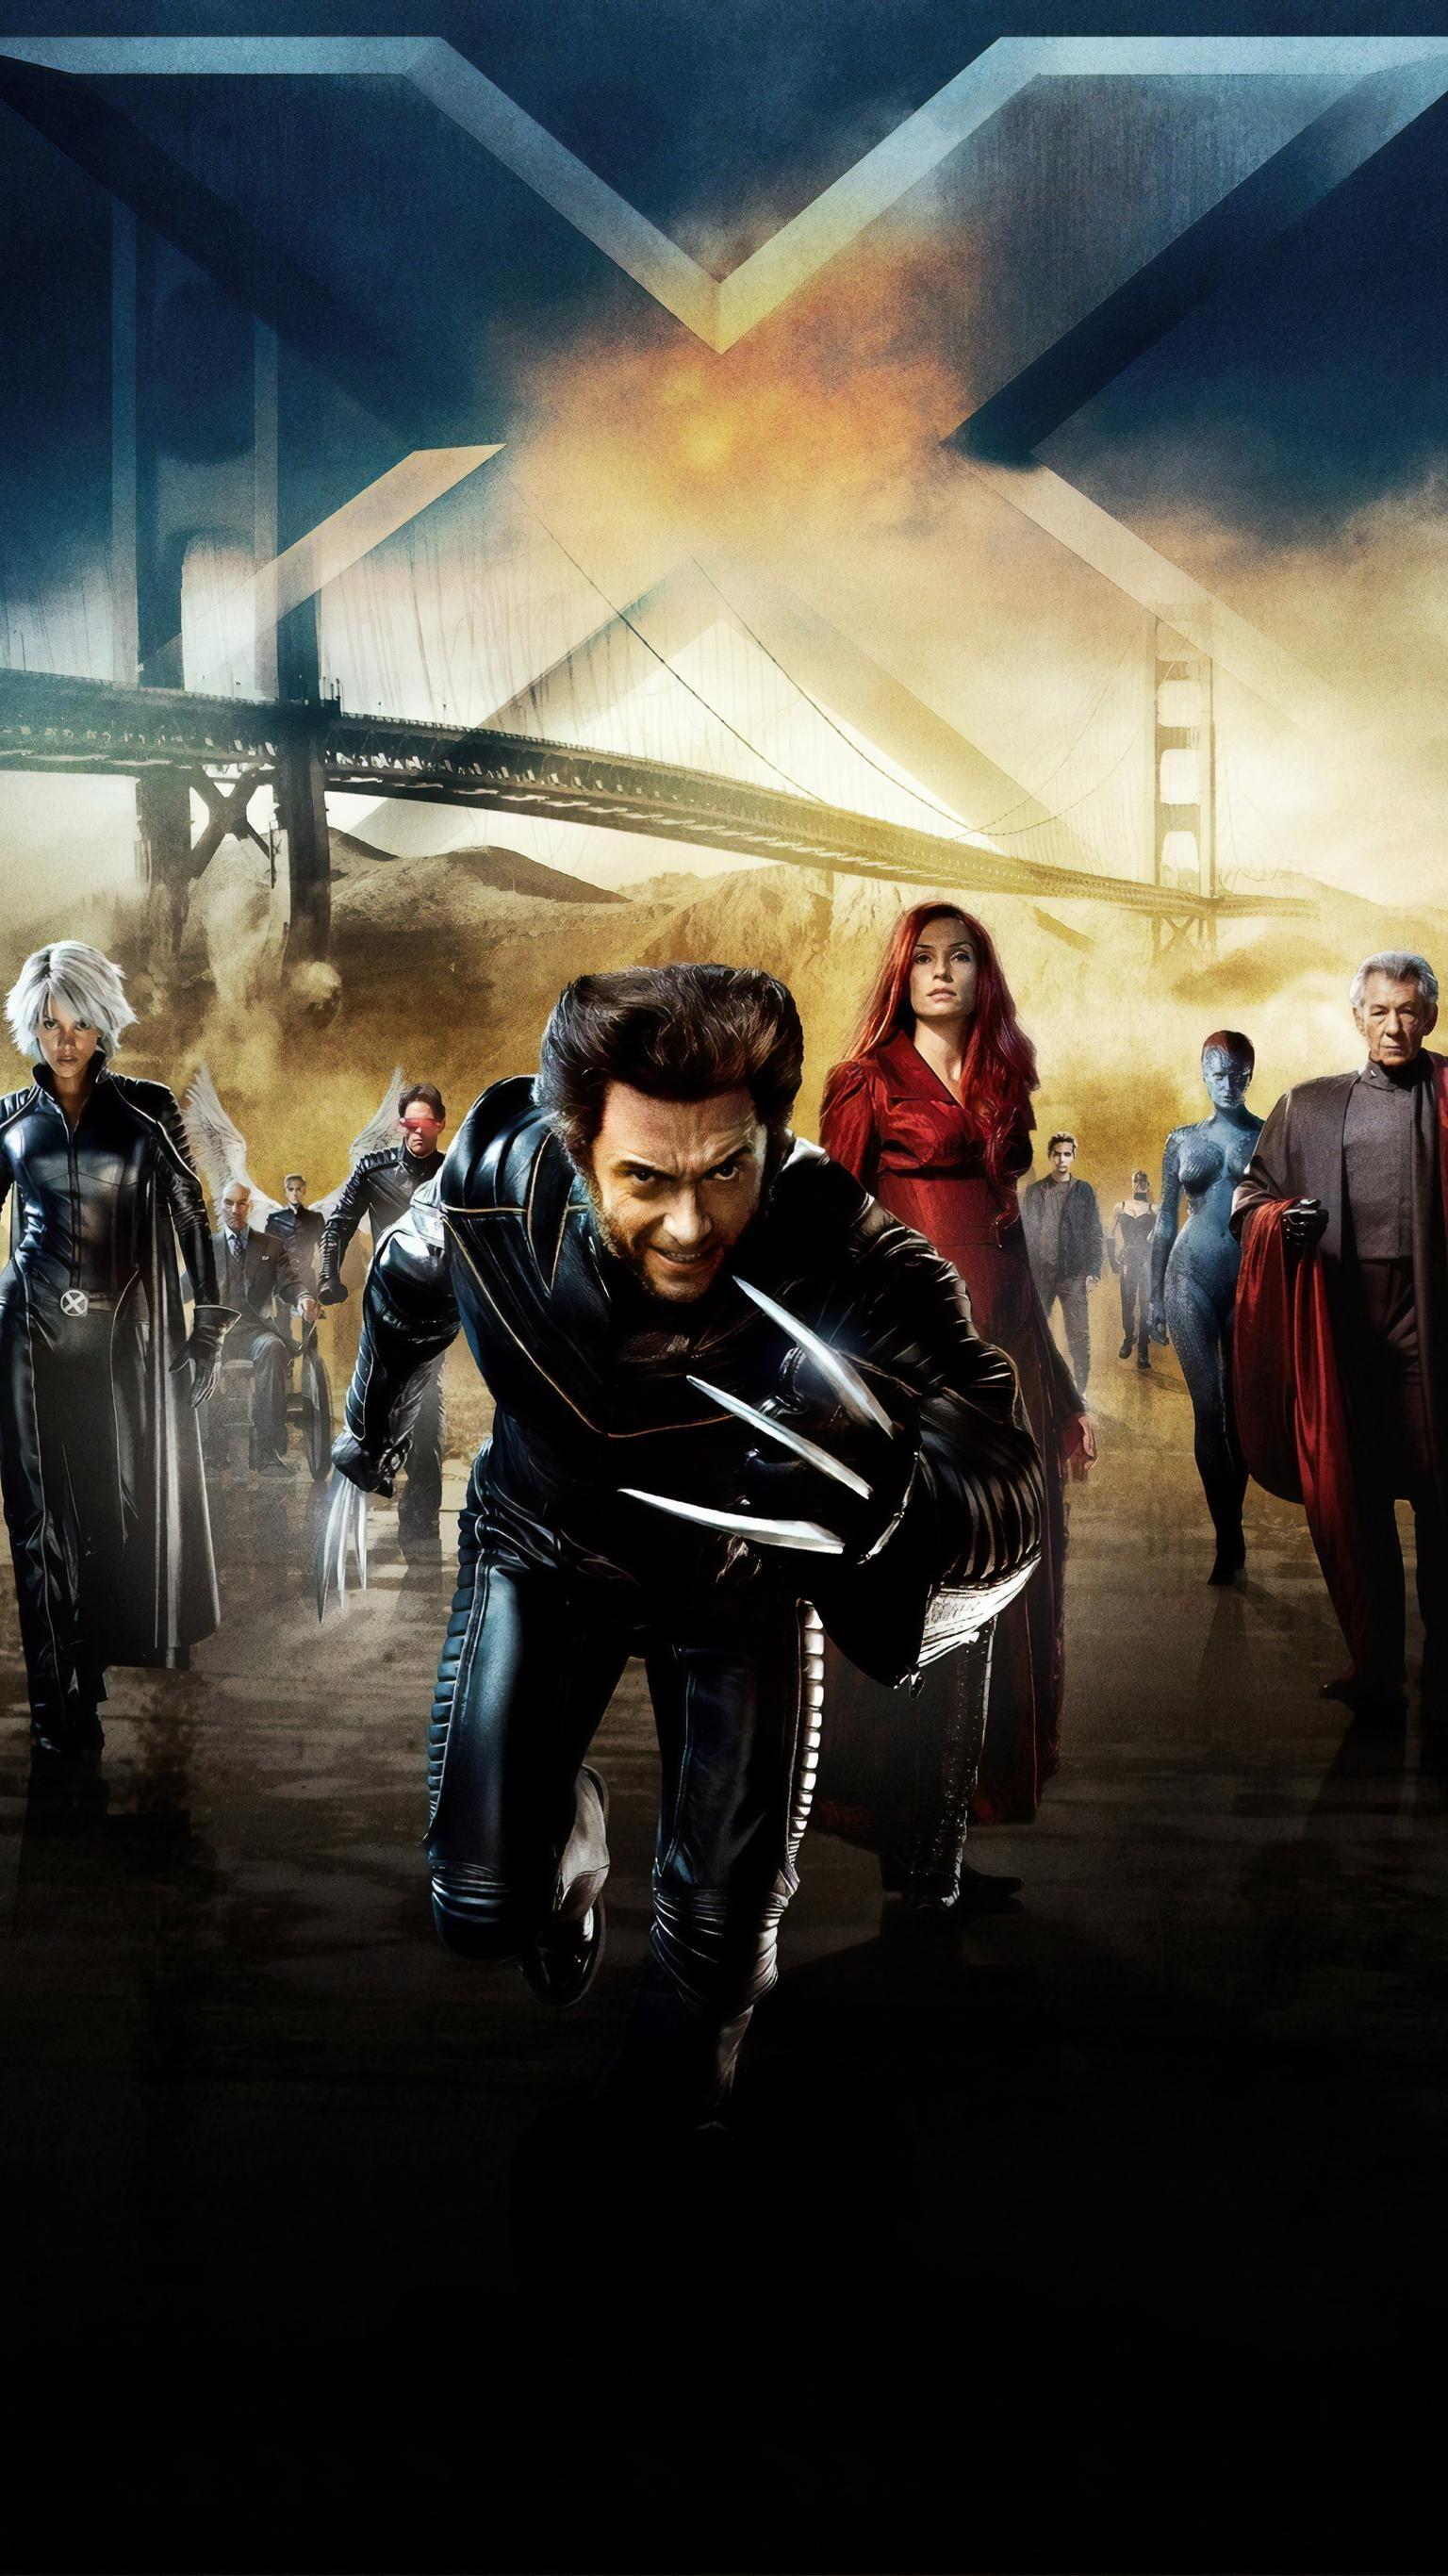 X-Men: The Last Stand (2006) Phone Wallpaper   Moviemania